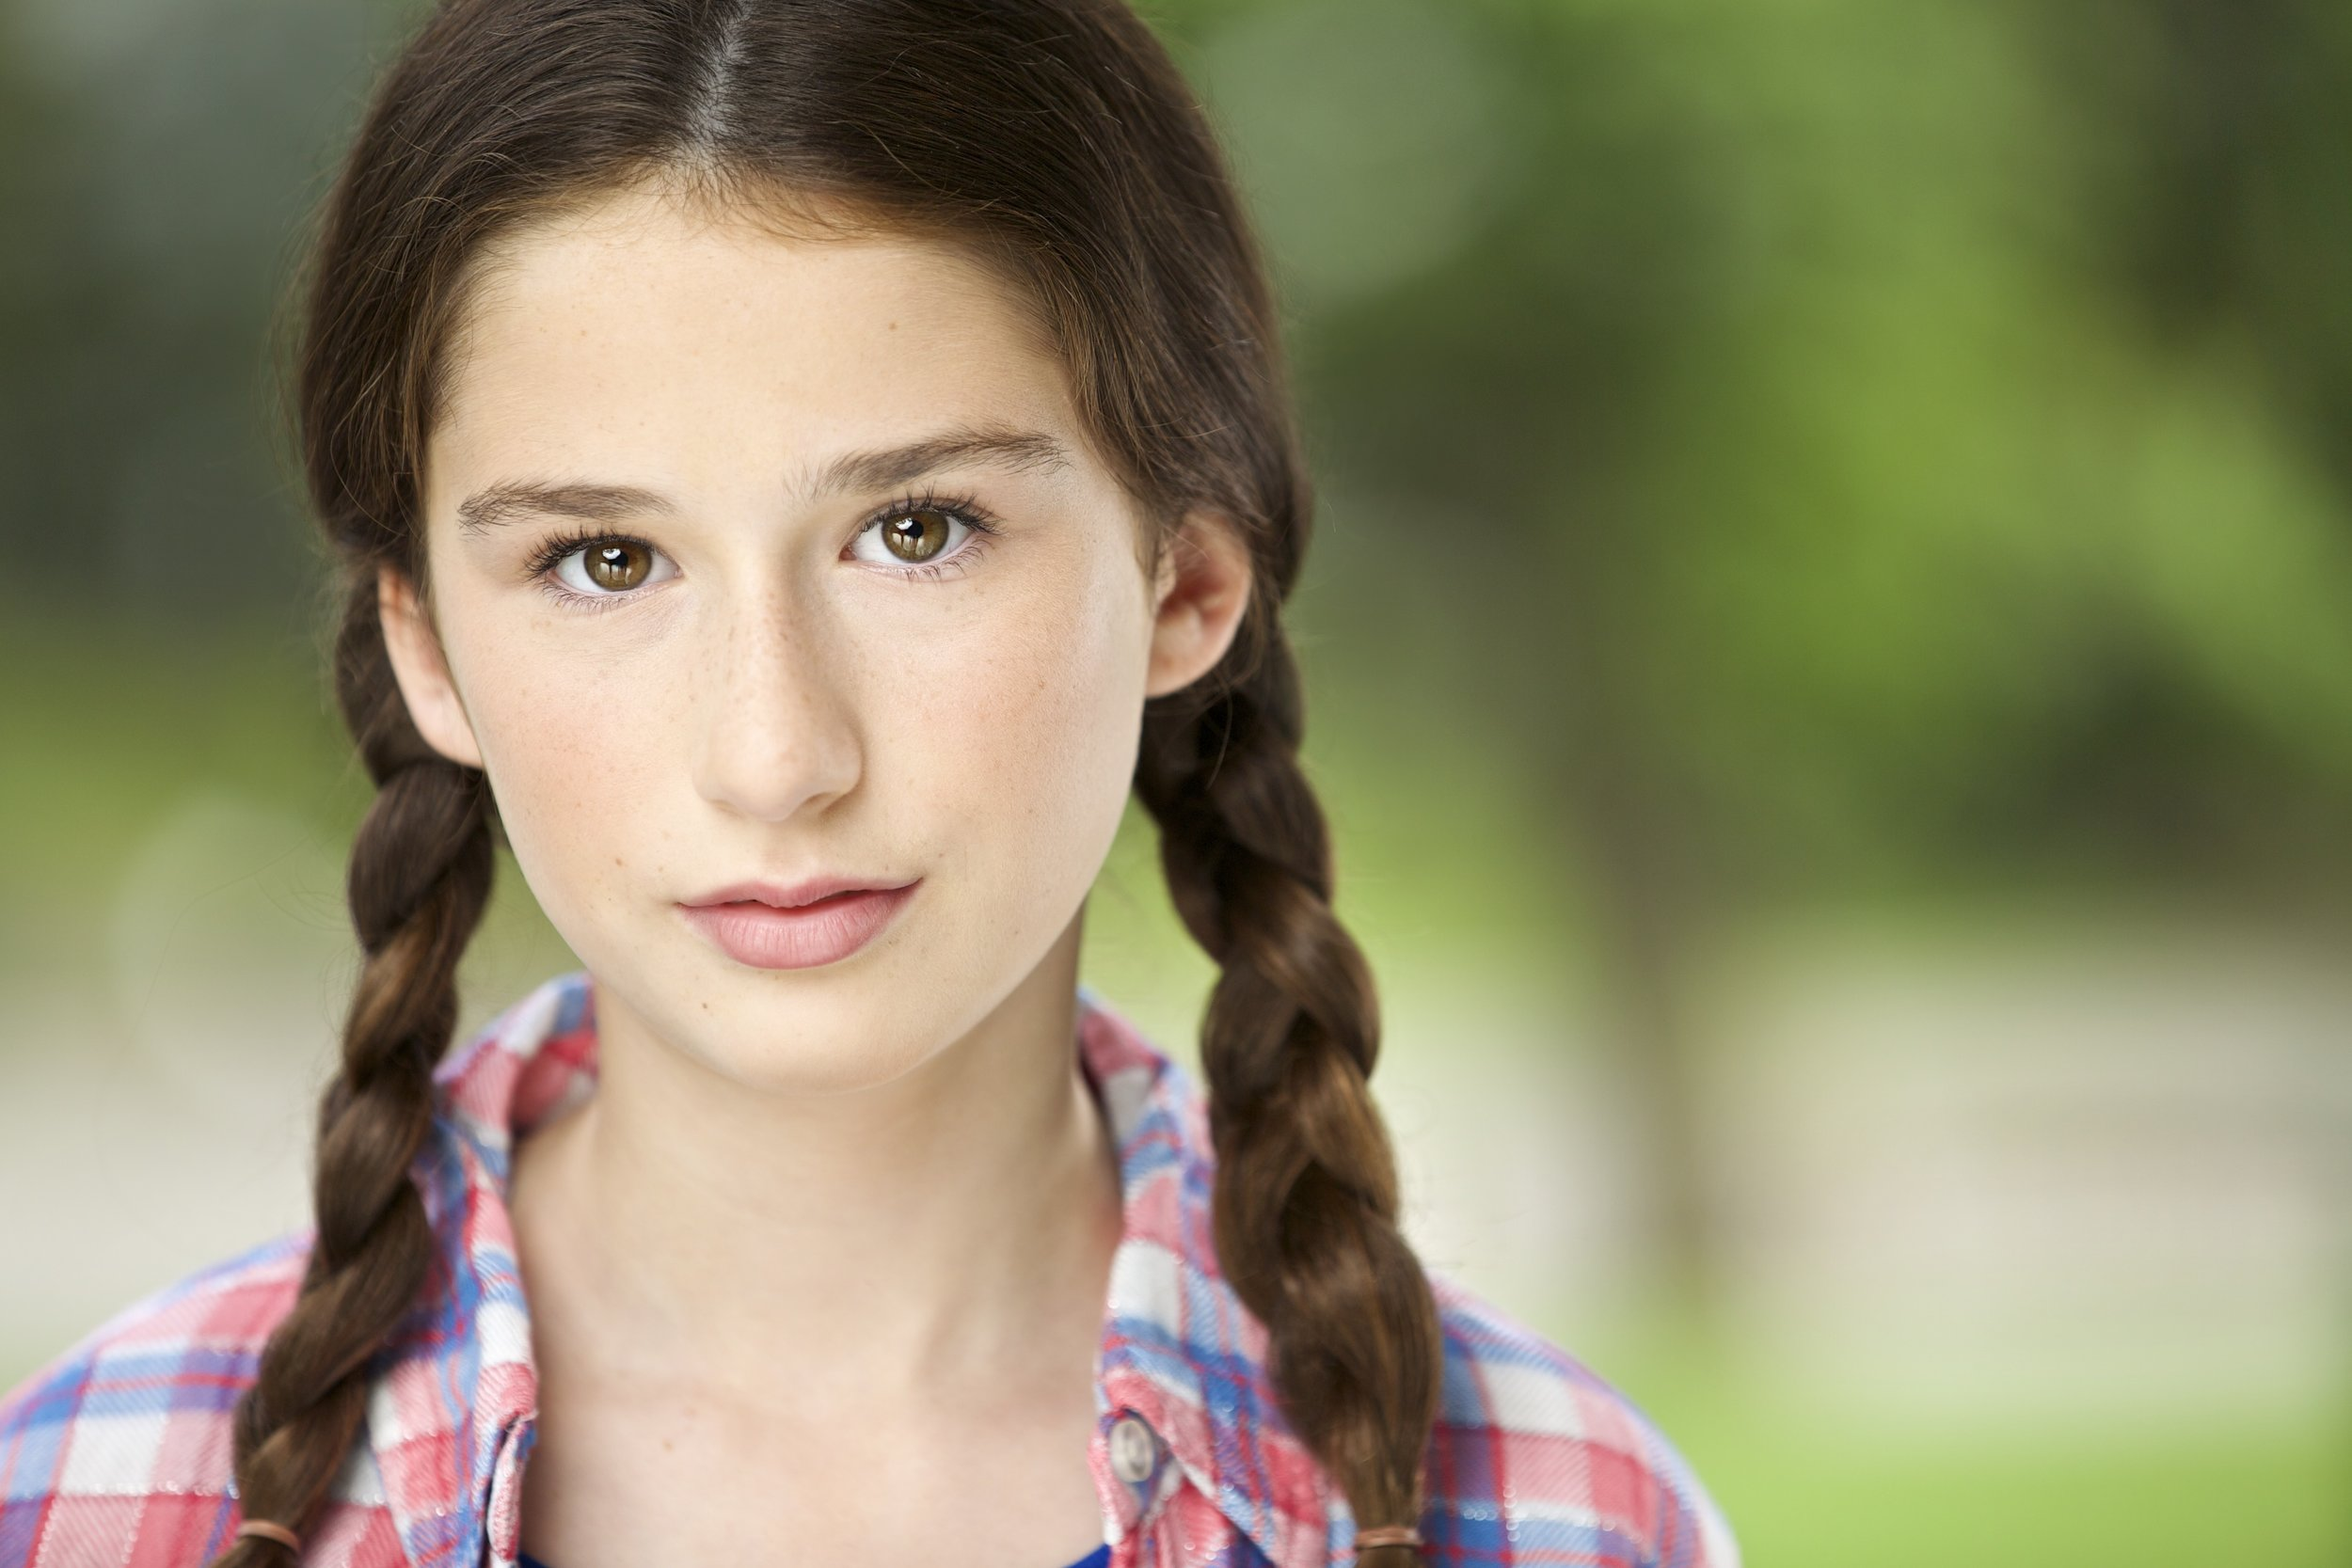 Samantha Rascio